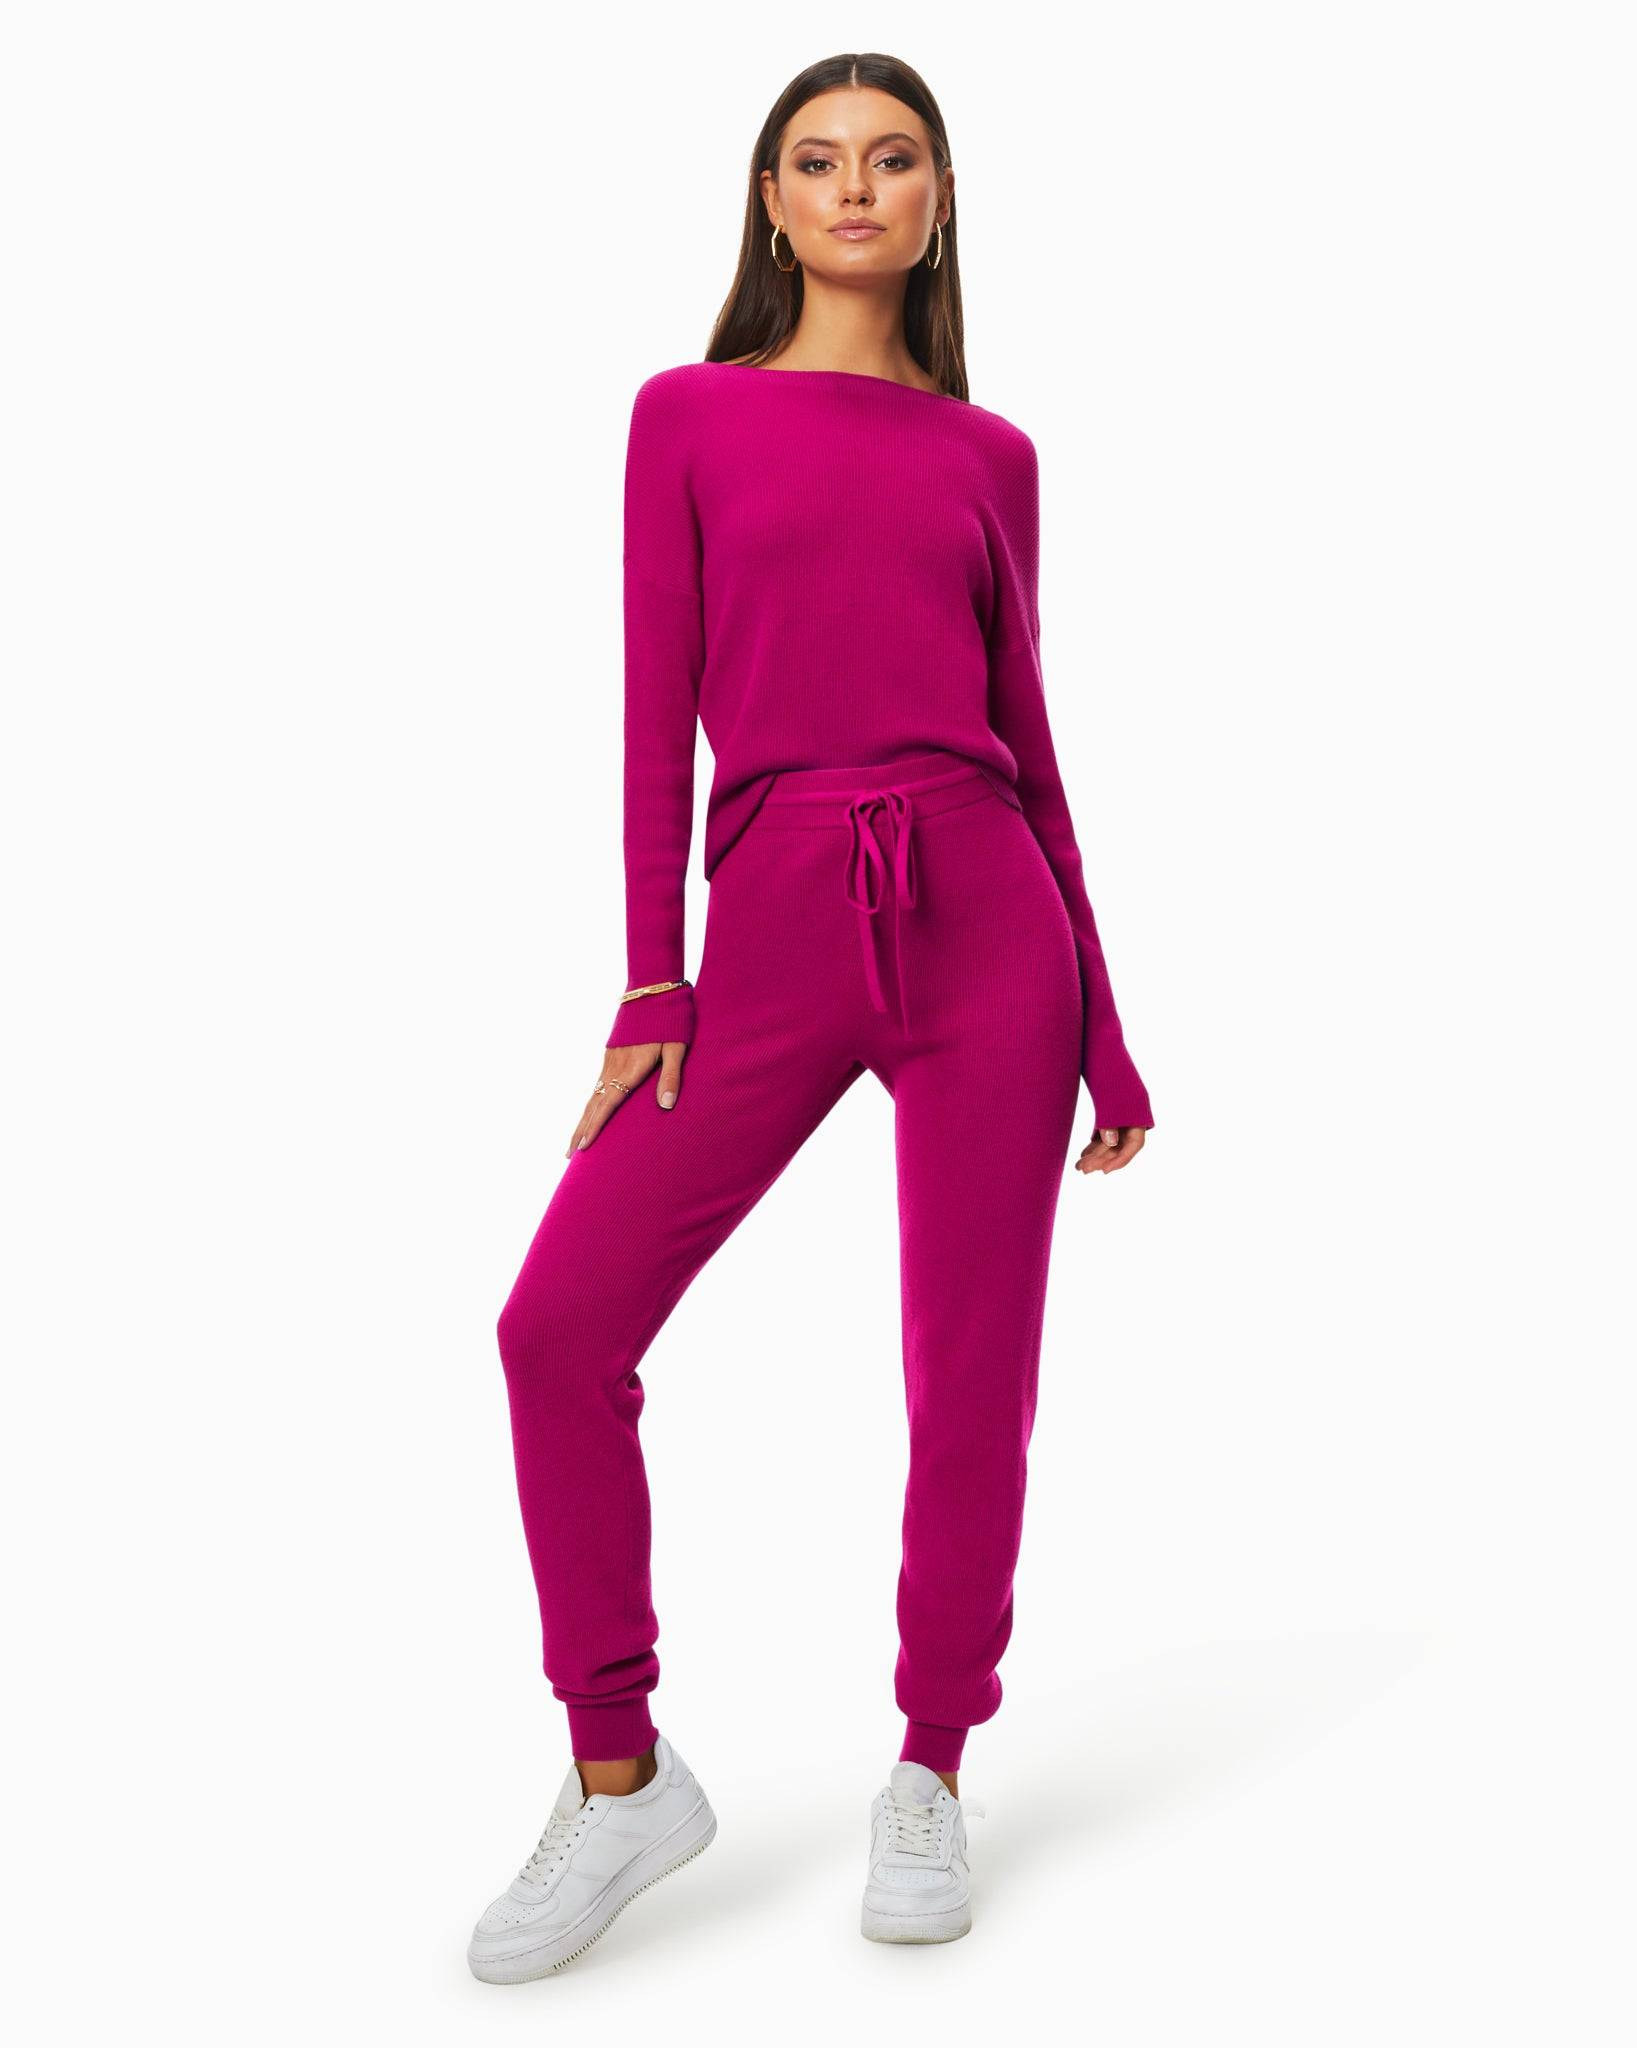 Landon Knit Jogger in Diva Pink - Diva Pink - Size: XXS